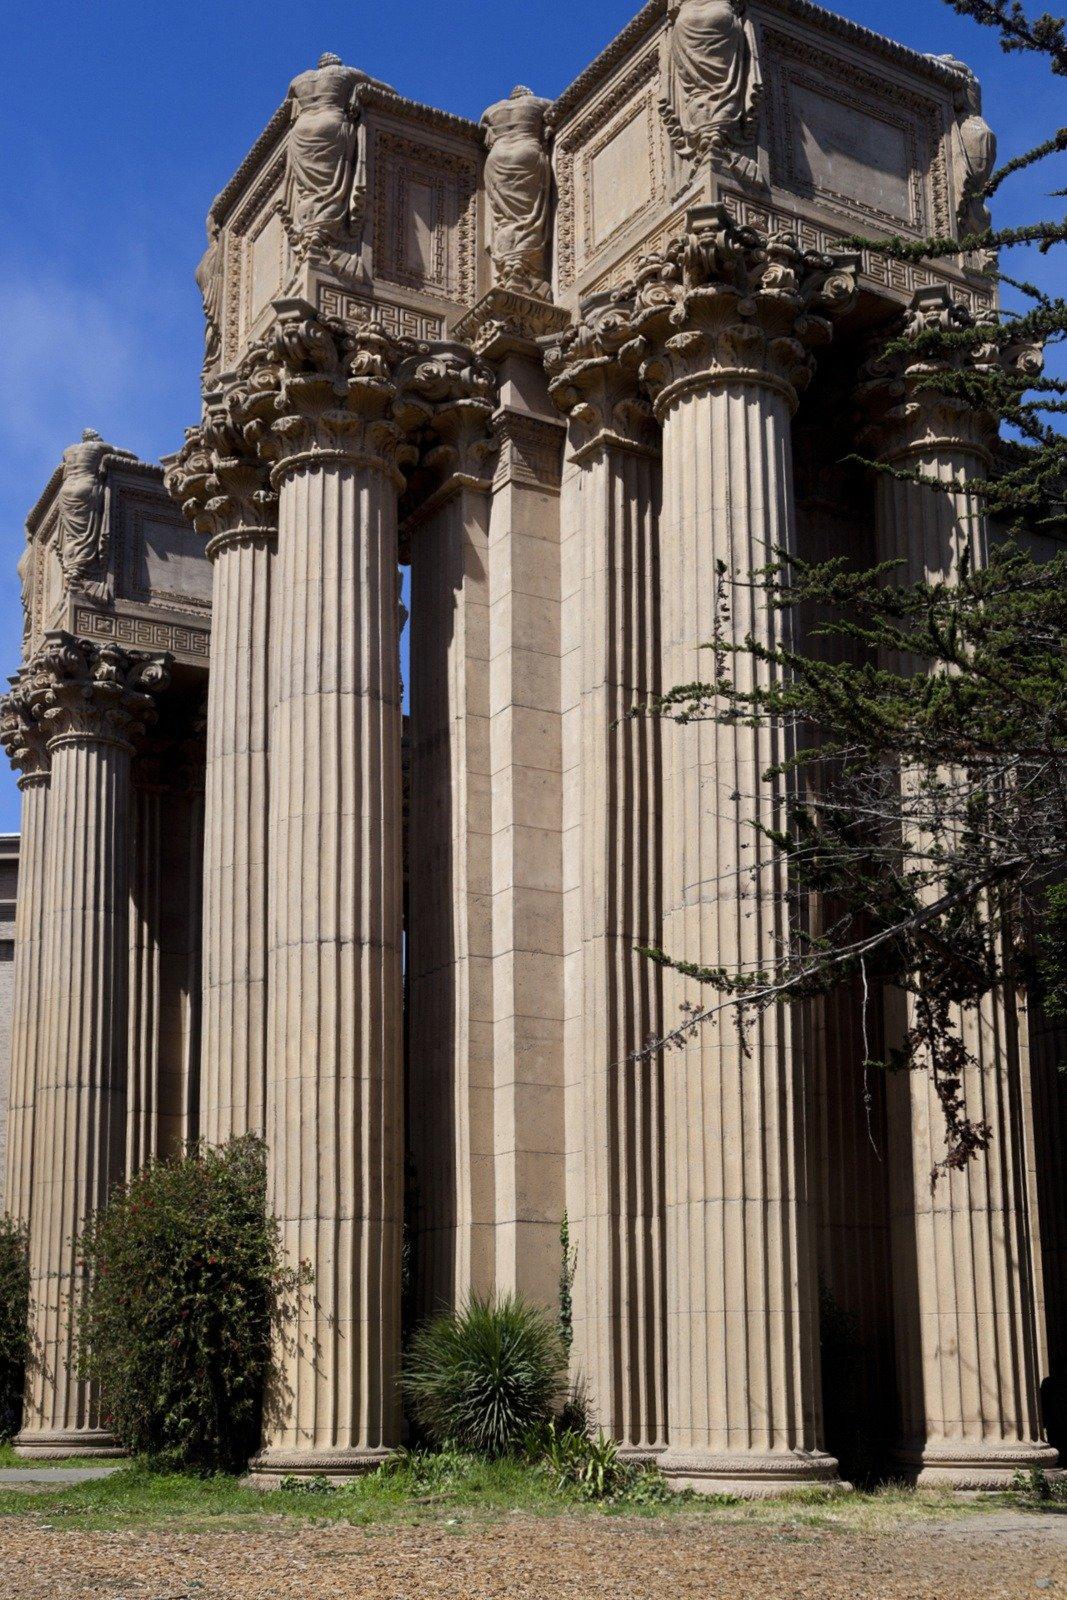 Columns at Palace of Fine Arts in San Francisco